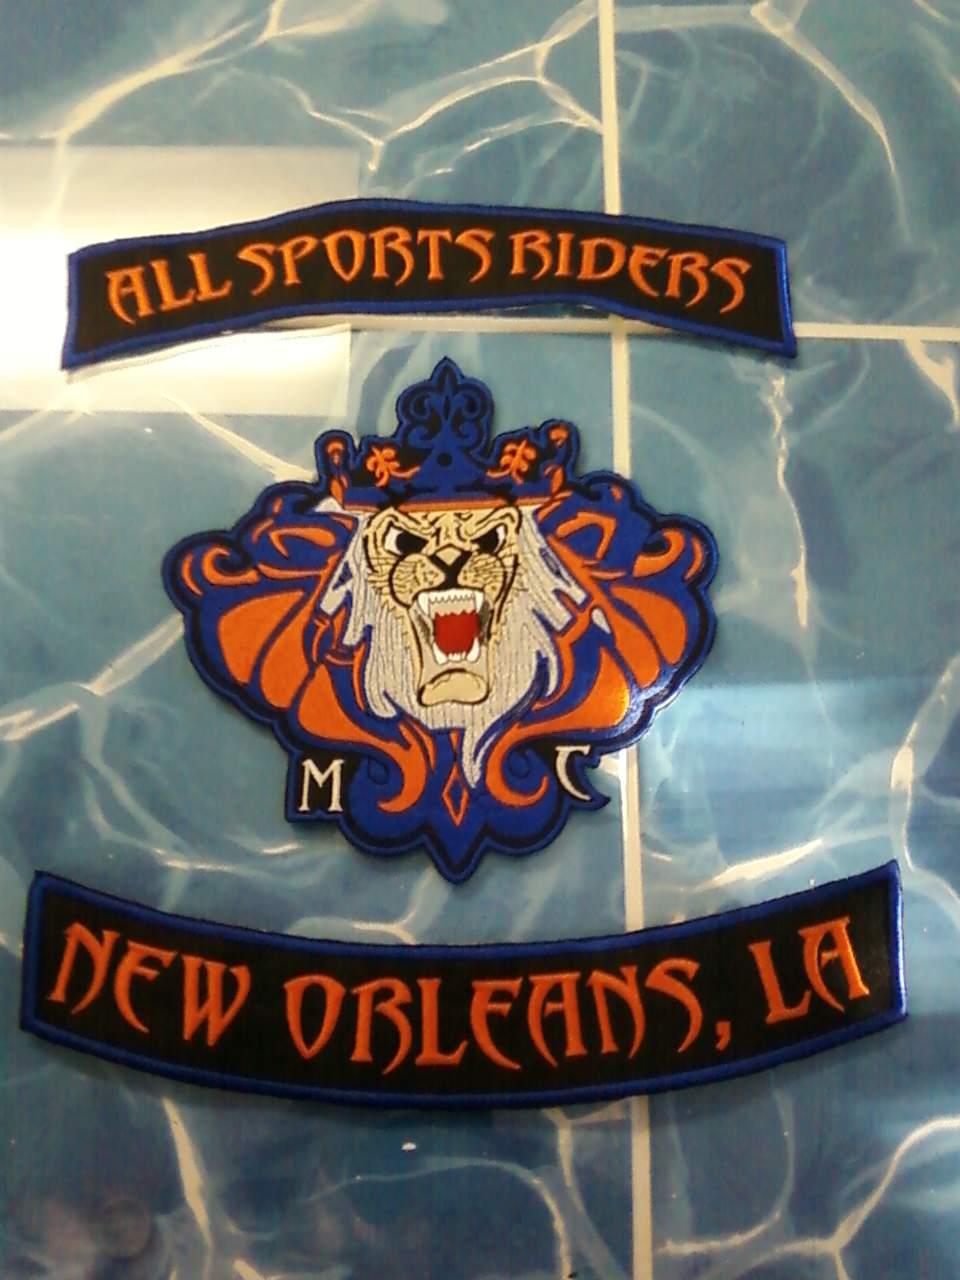 allsports riders logo